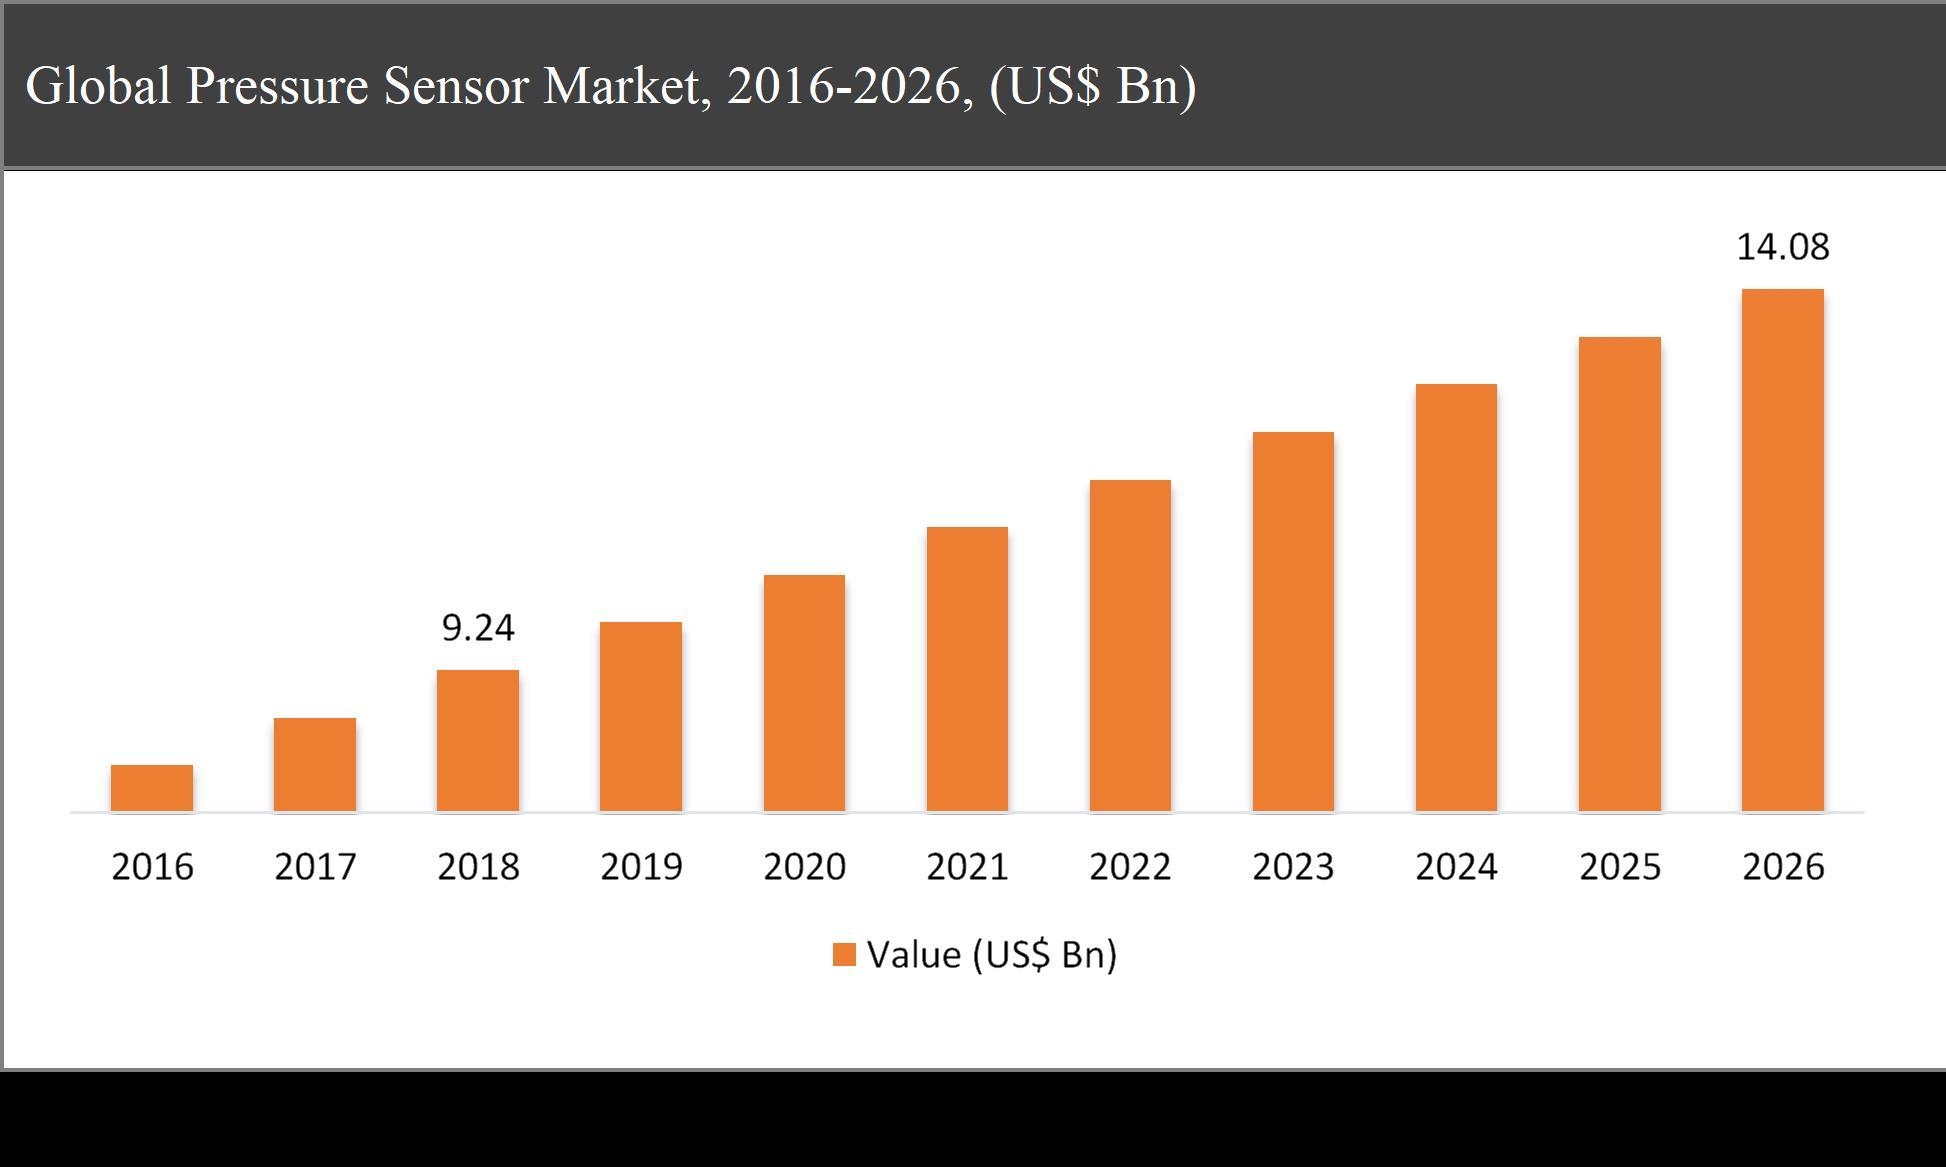 Global Pressure Sensor Market, 2016-2026, (US$ Bn)